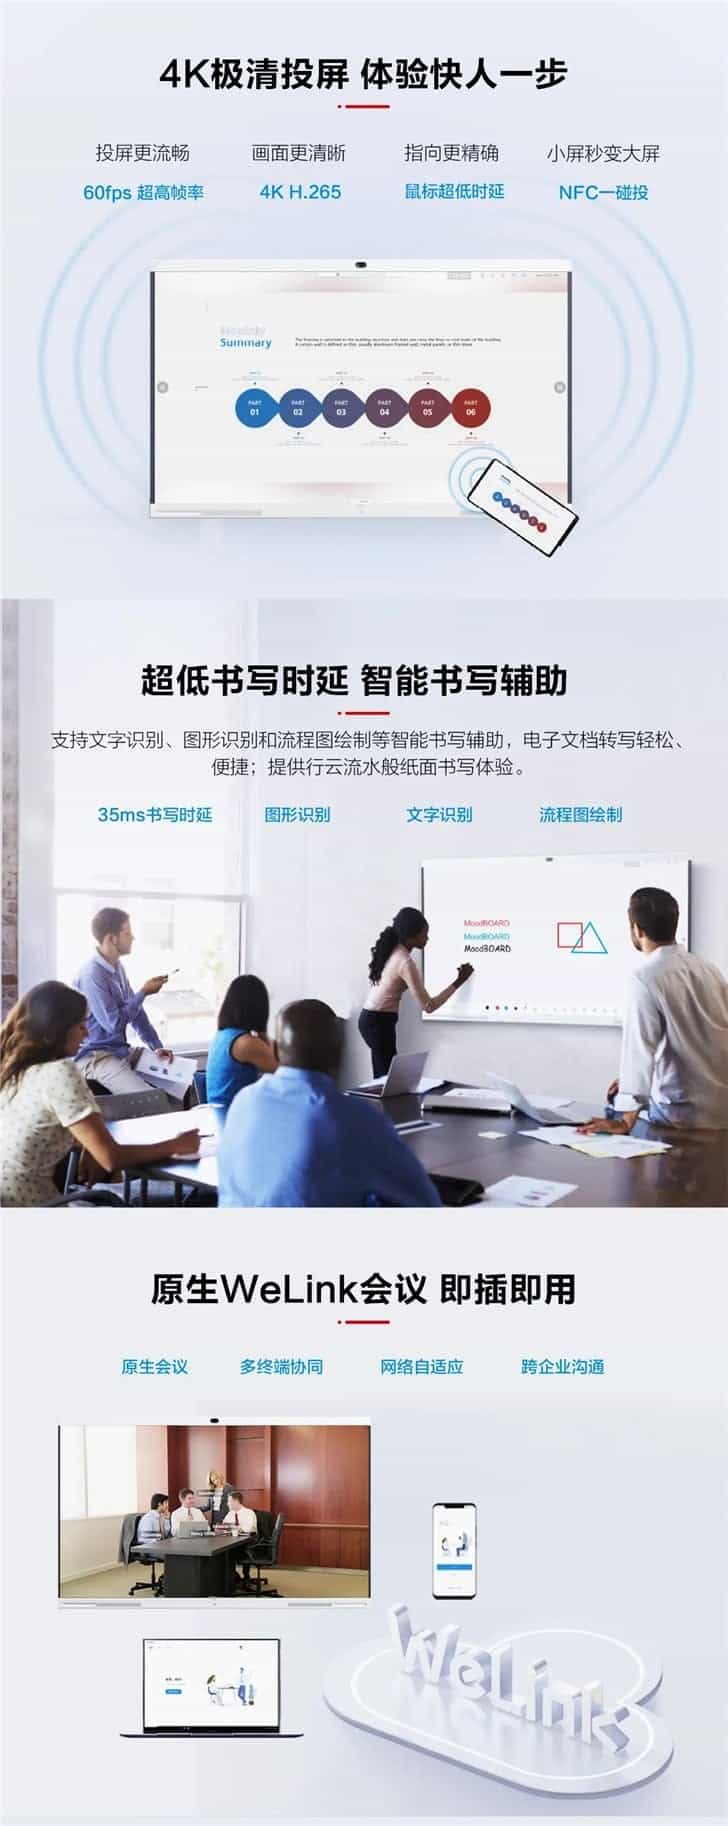 Huawei Enterprise Smart Screen IdeaHub